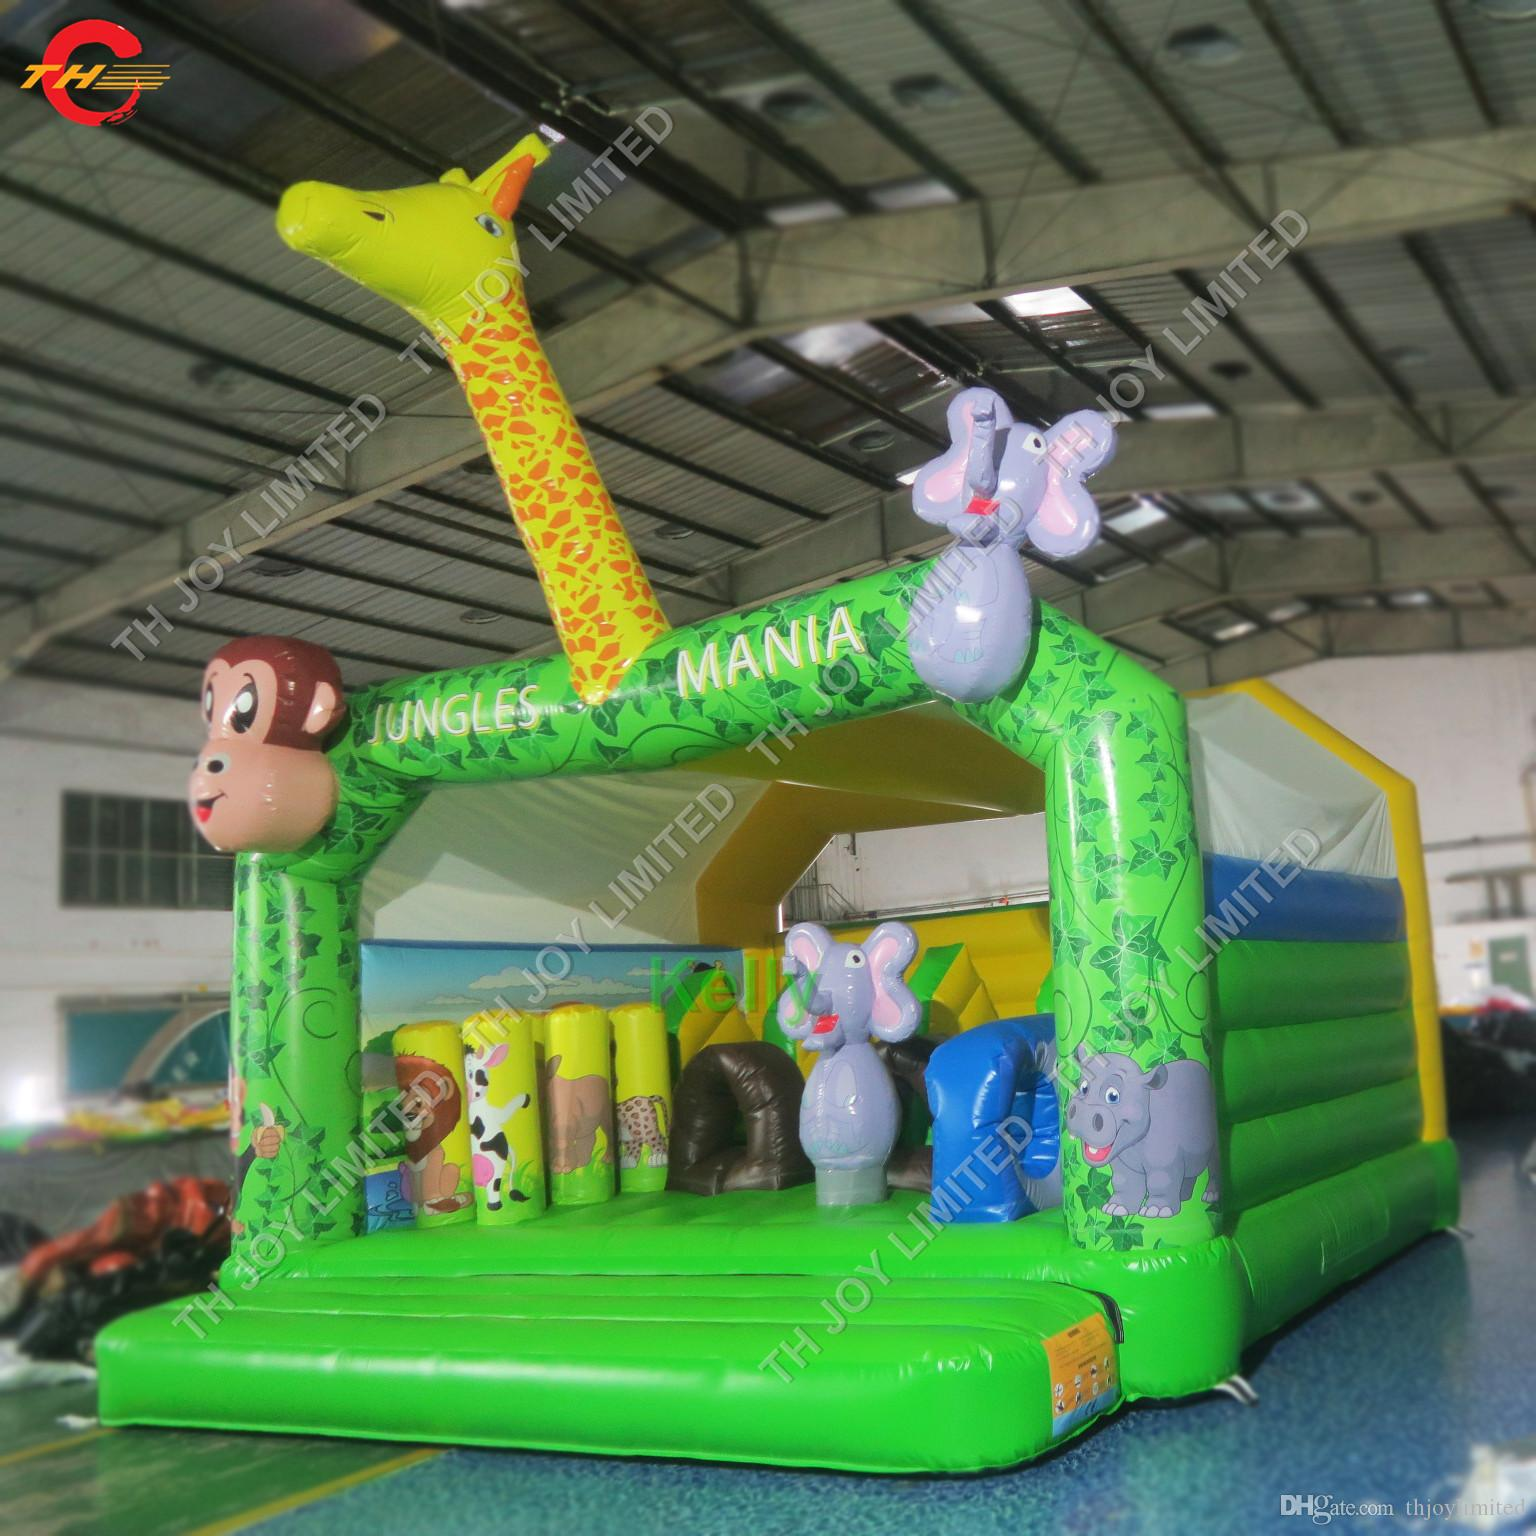 cheap jungle animal inflatable bouncer moonwalk monkey giraffe elephant inflatable bounce house jumping house bouncy castle